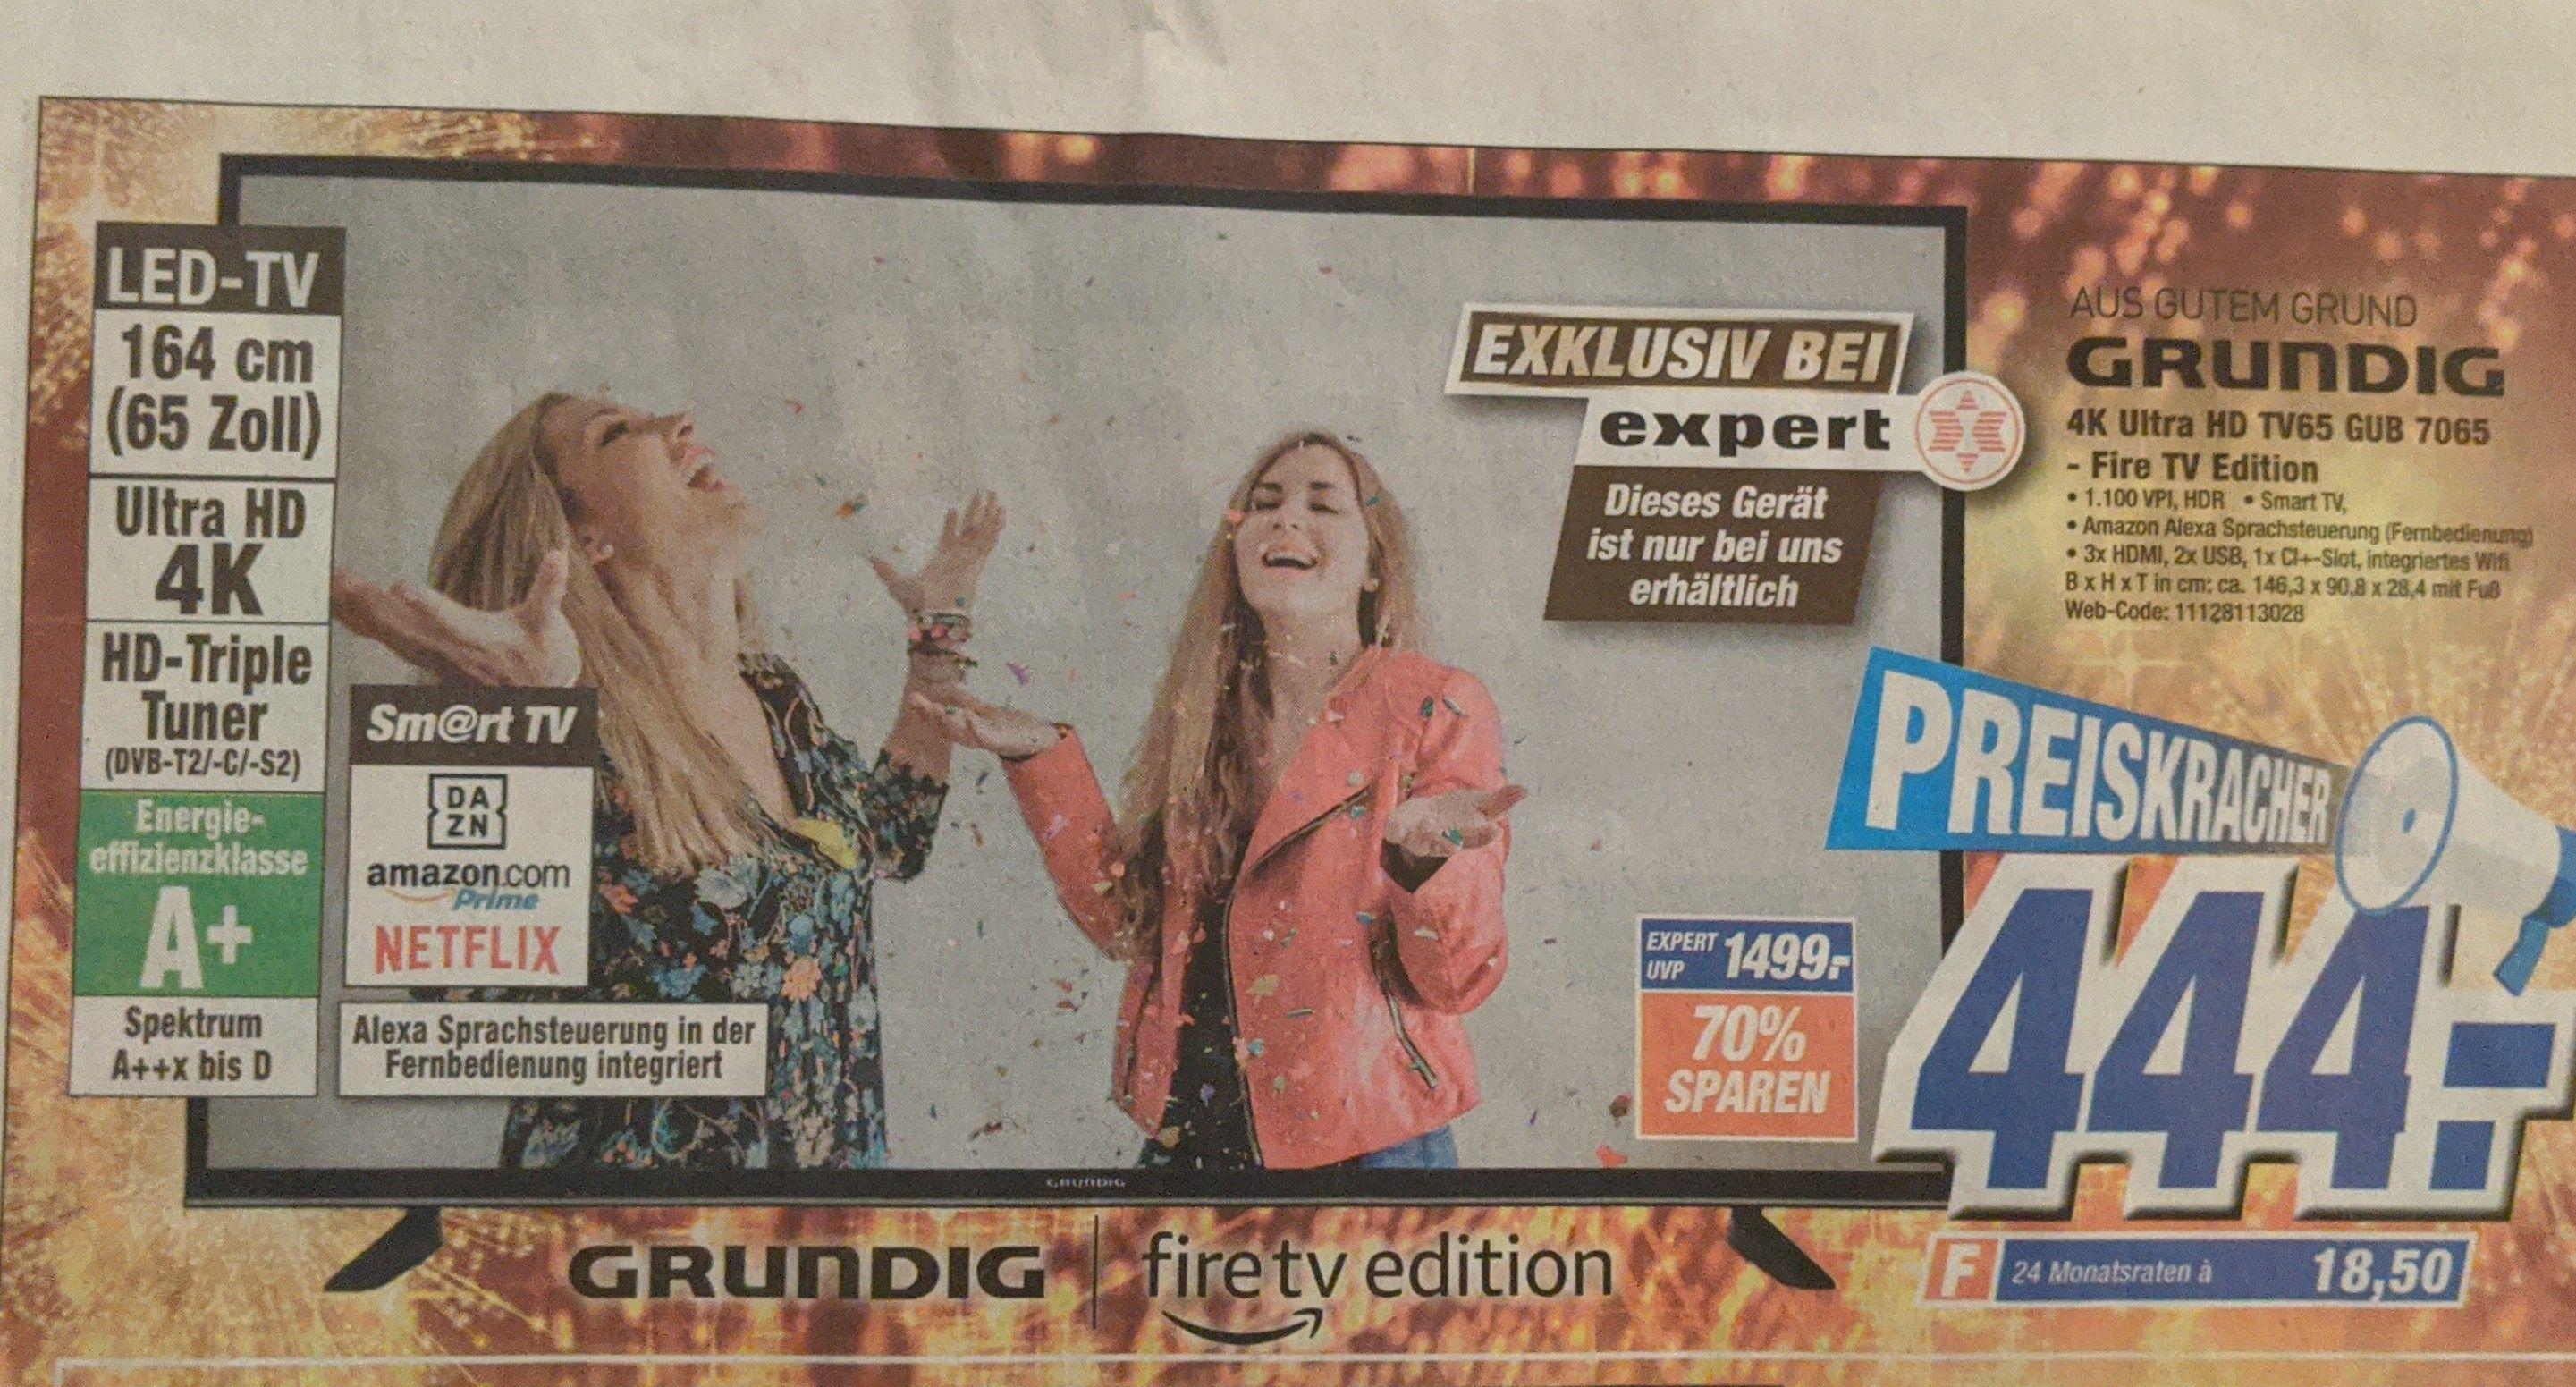 (Lokal - Expert Westküste) Grundig GUB 7065 4K UHD 65 Zoll Fire TV Edition